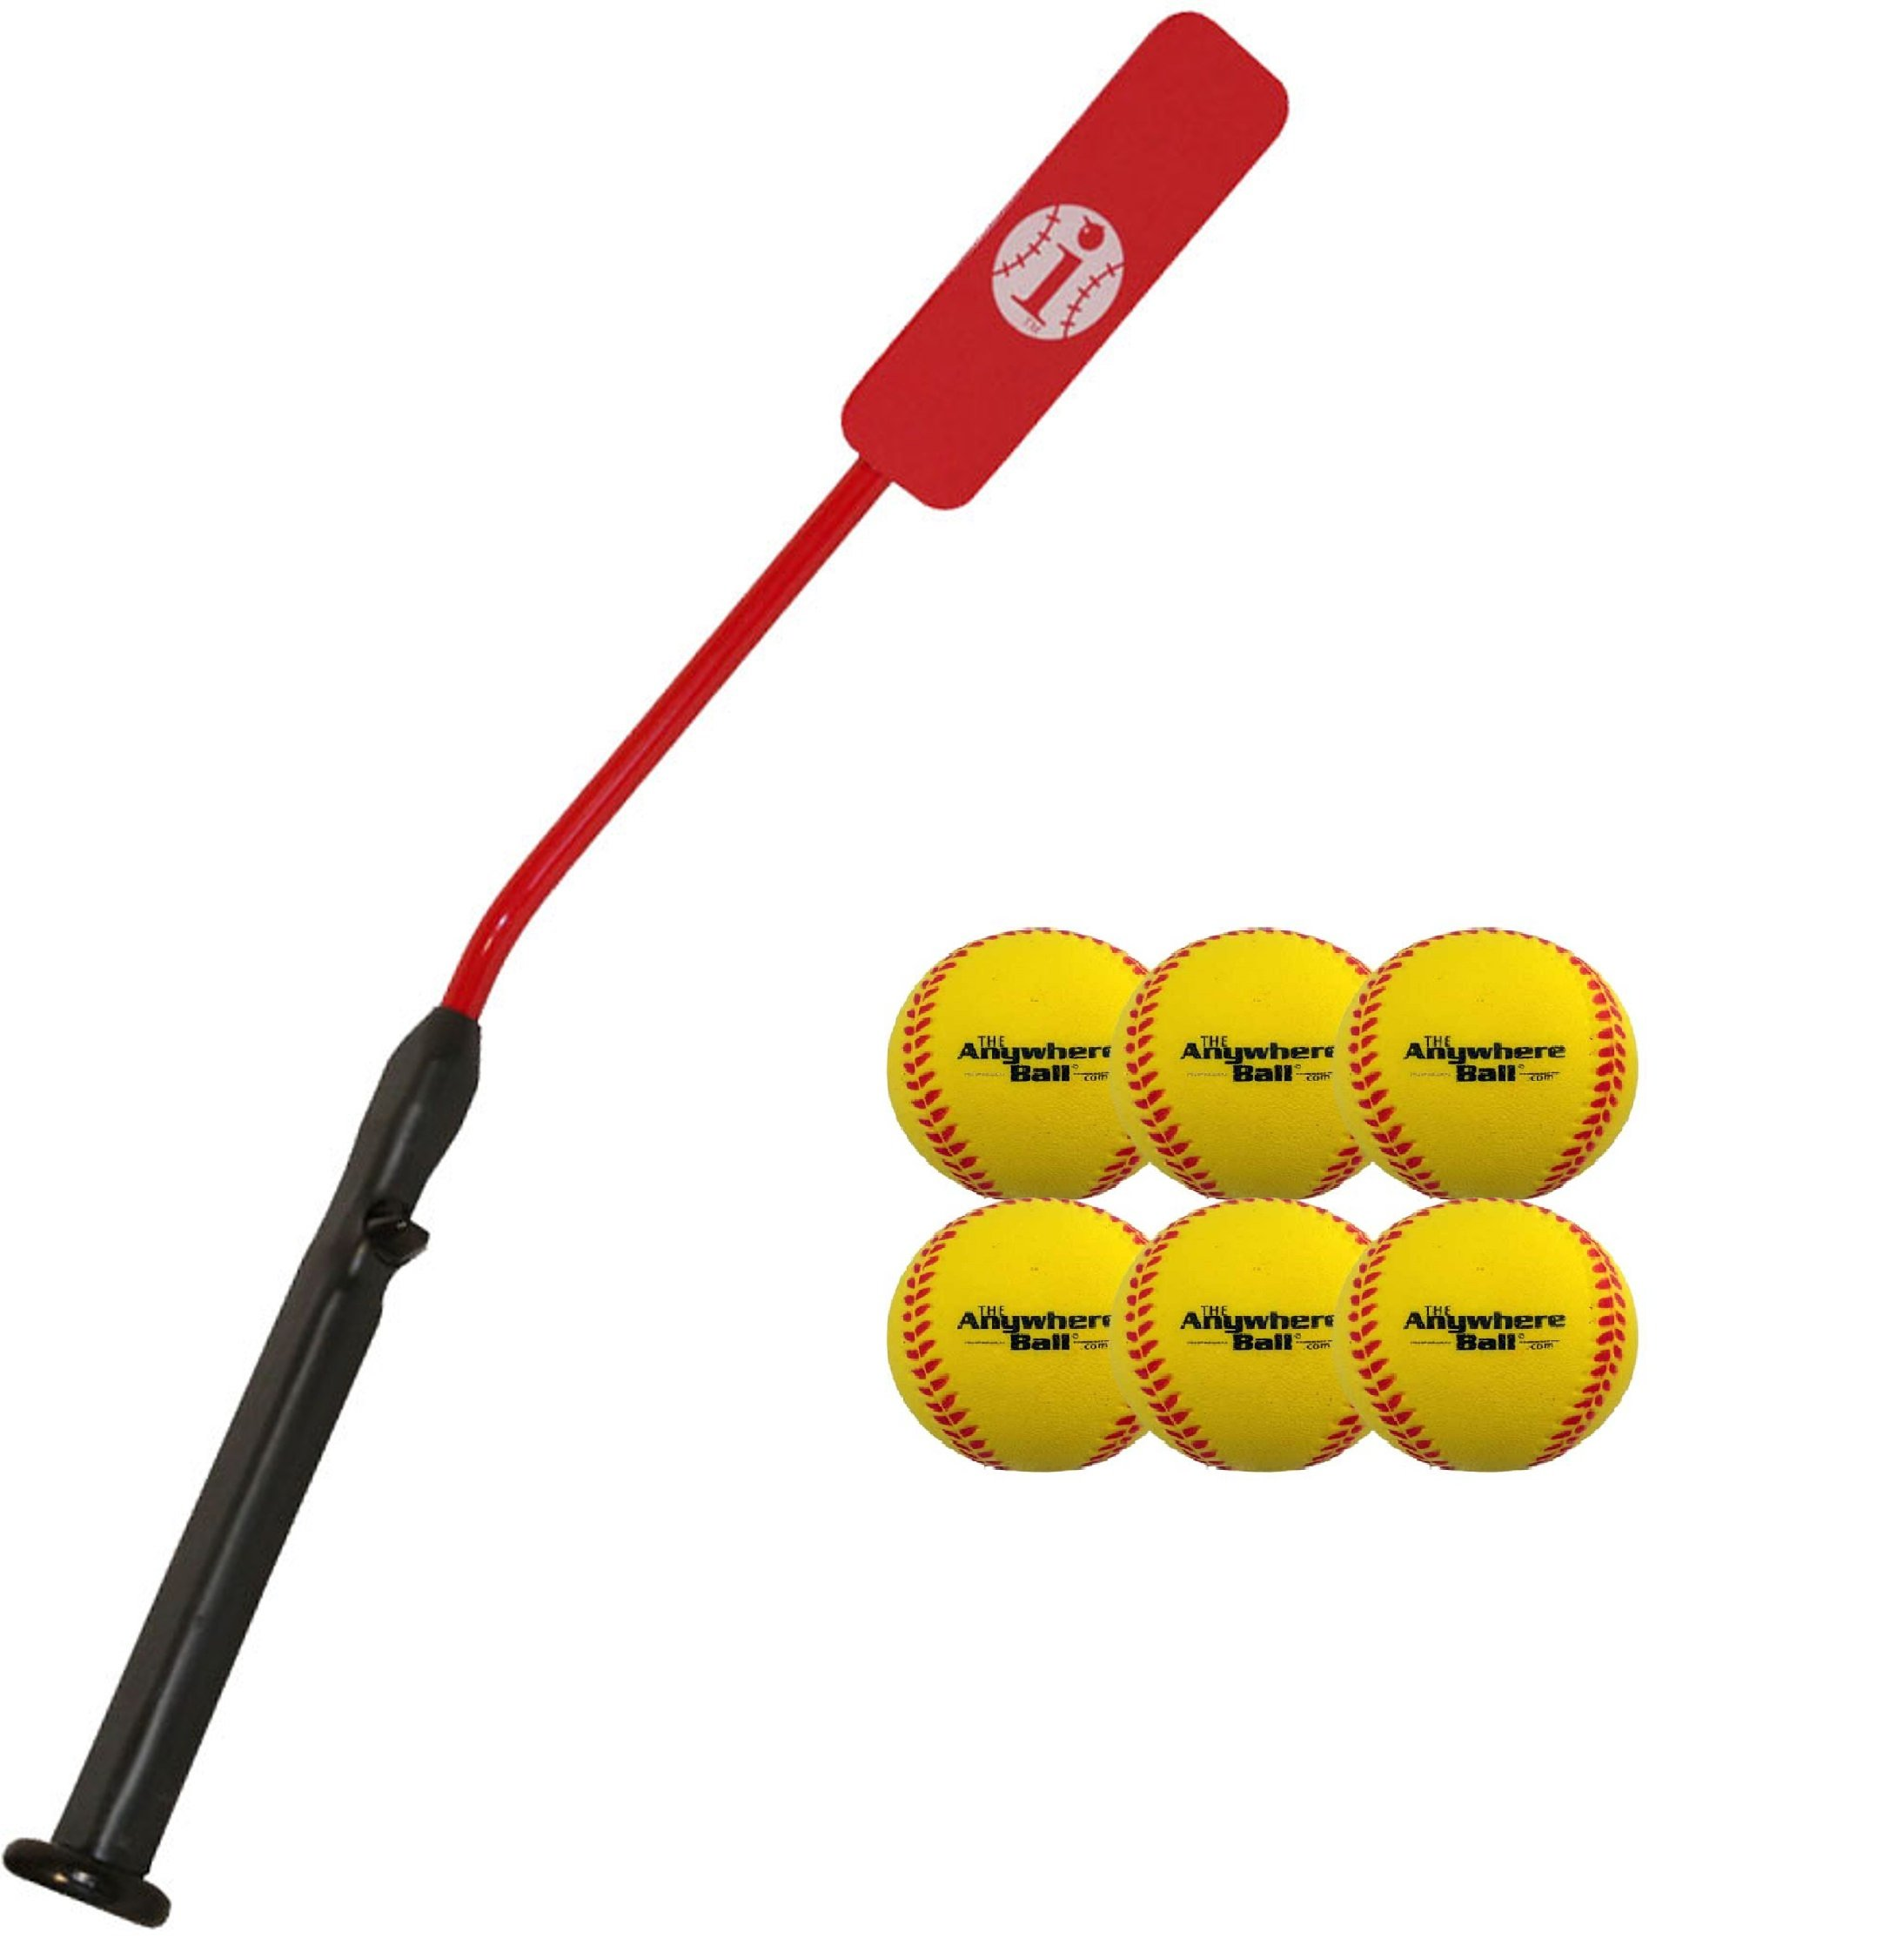 Insider Bat Size 6 and Anywhere Ball Complete Baseball Softball Batting Practice Kit (1 Bat & 6 Balls) by Mpo